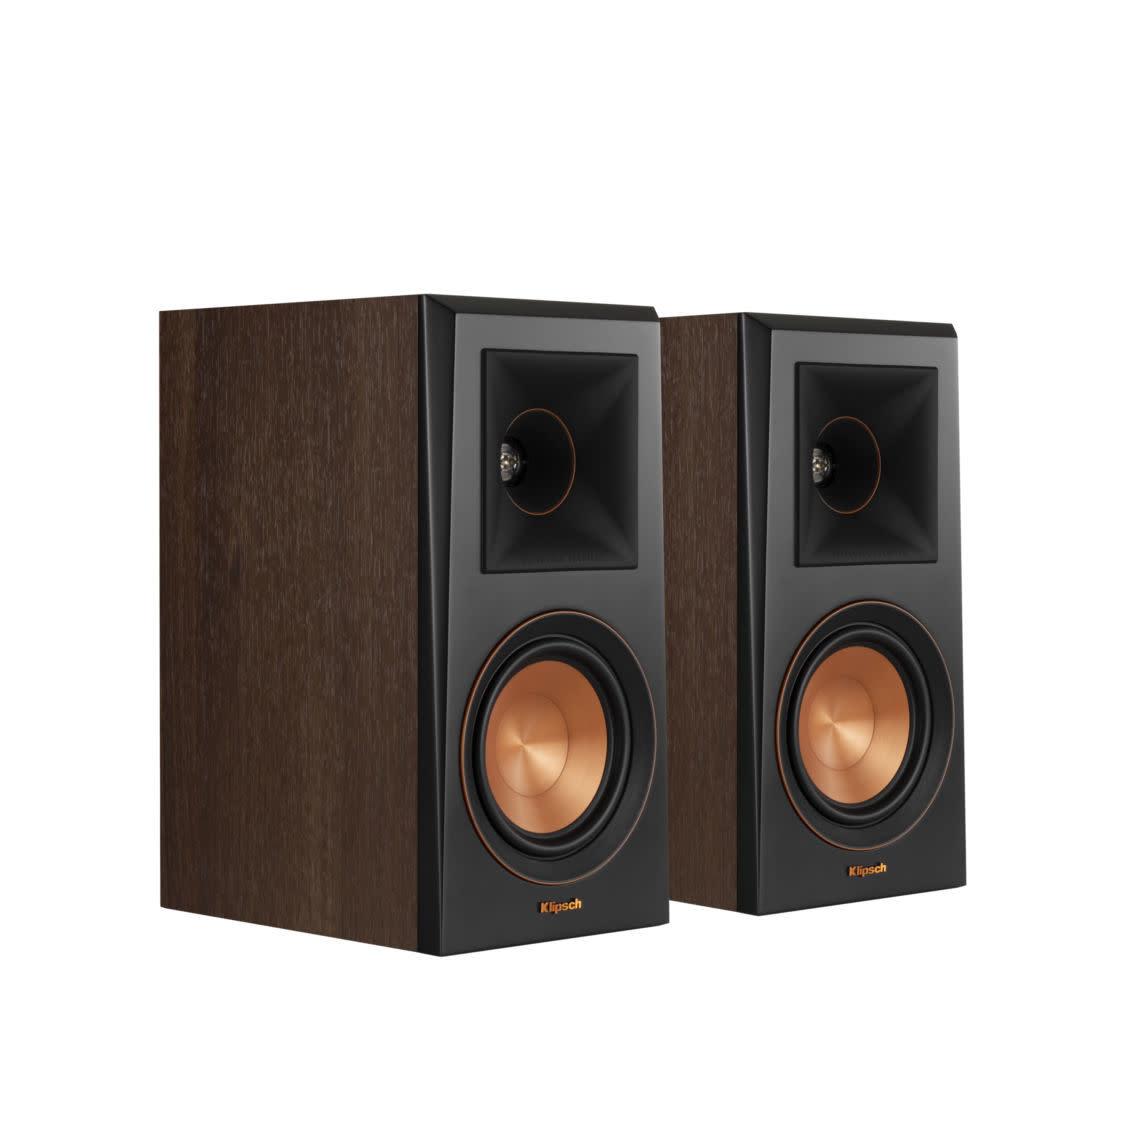 Klipsch Klipsch RP-500M Bookshelf Speakers (Ebony Pair)